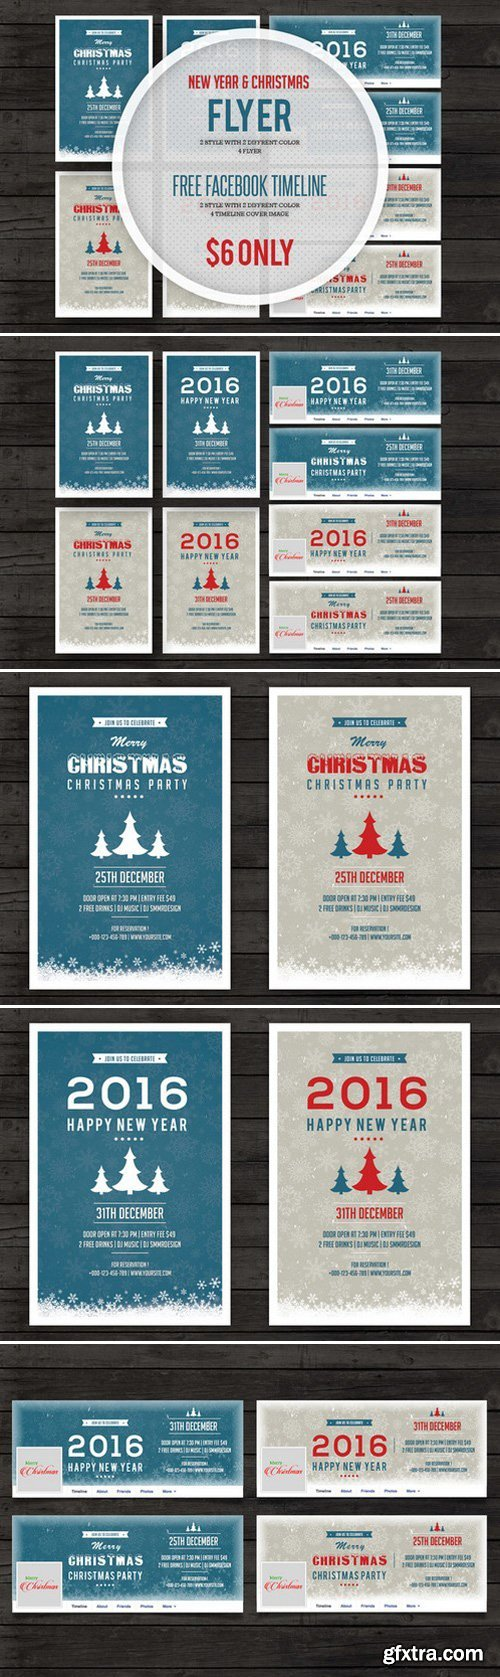 CM - New Year 2016 & Christmas Flyer 442370